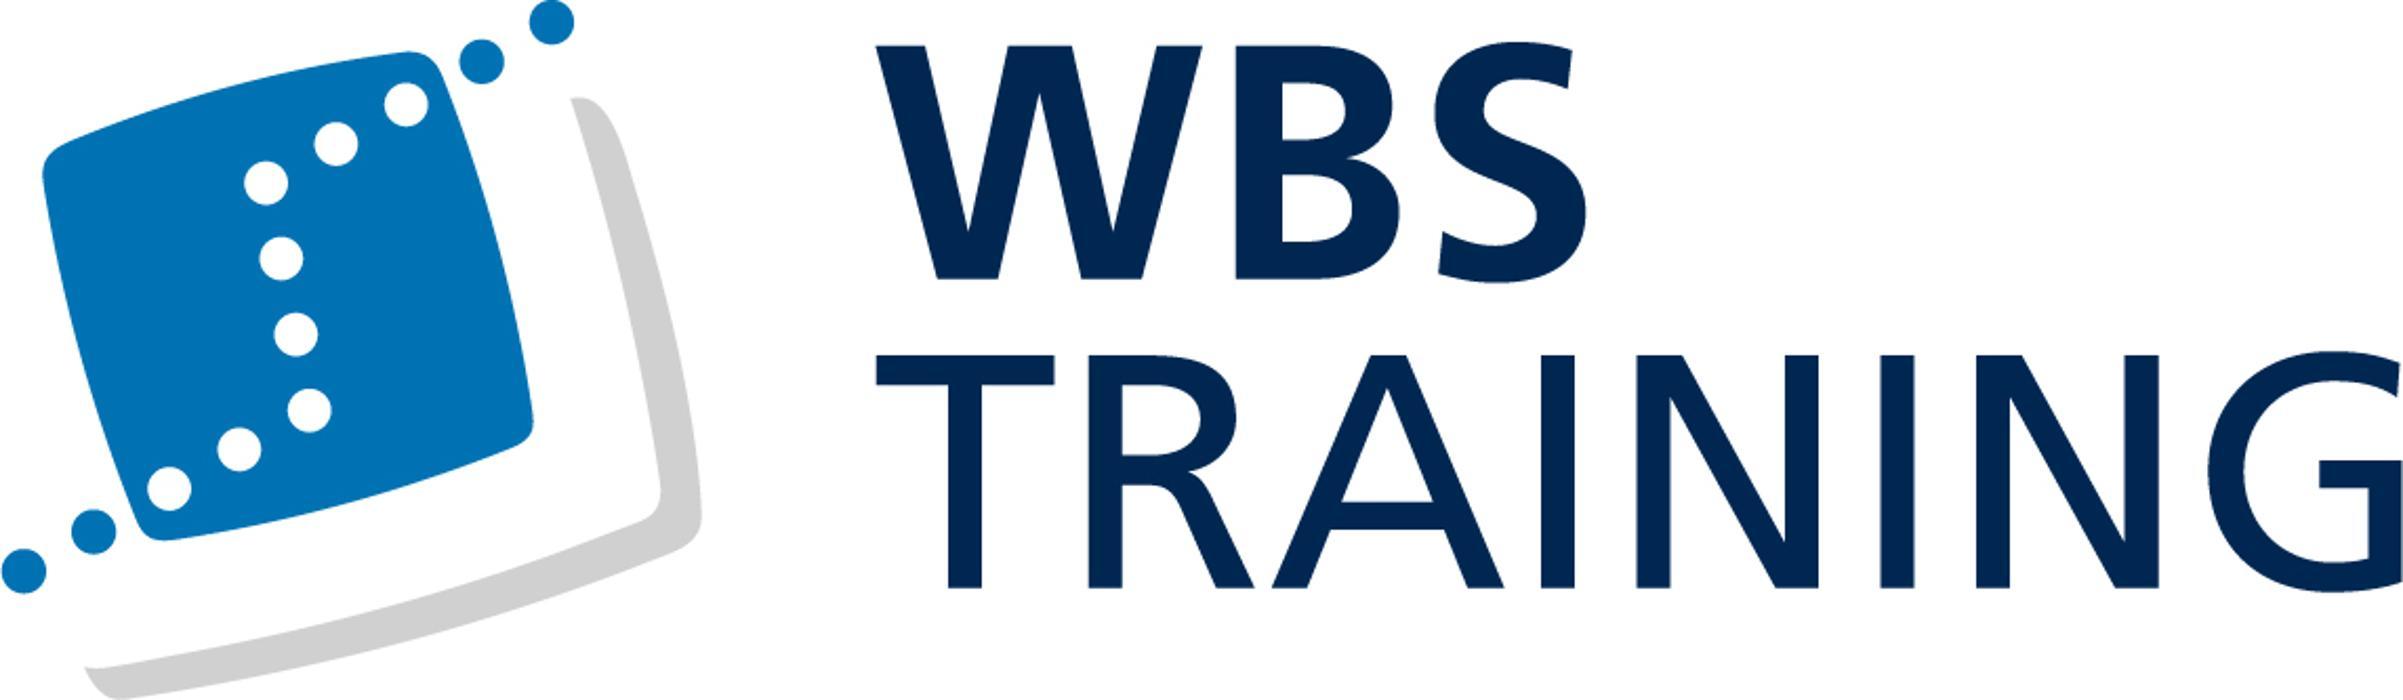 Bild zu WBS TRAINING Greifswald in Greifswald